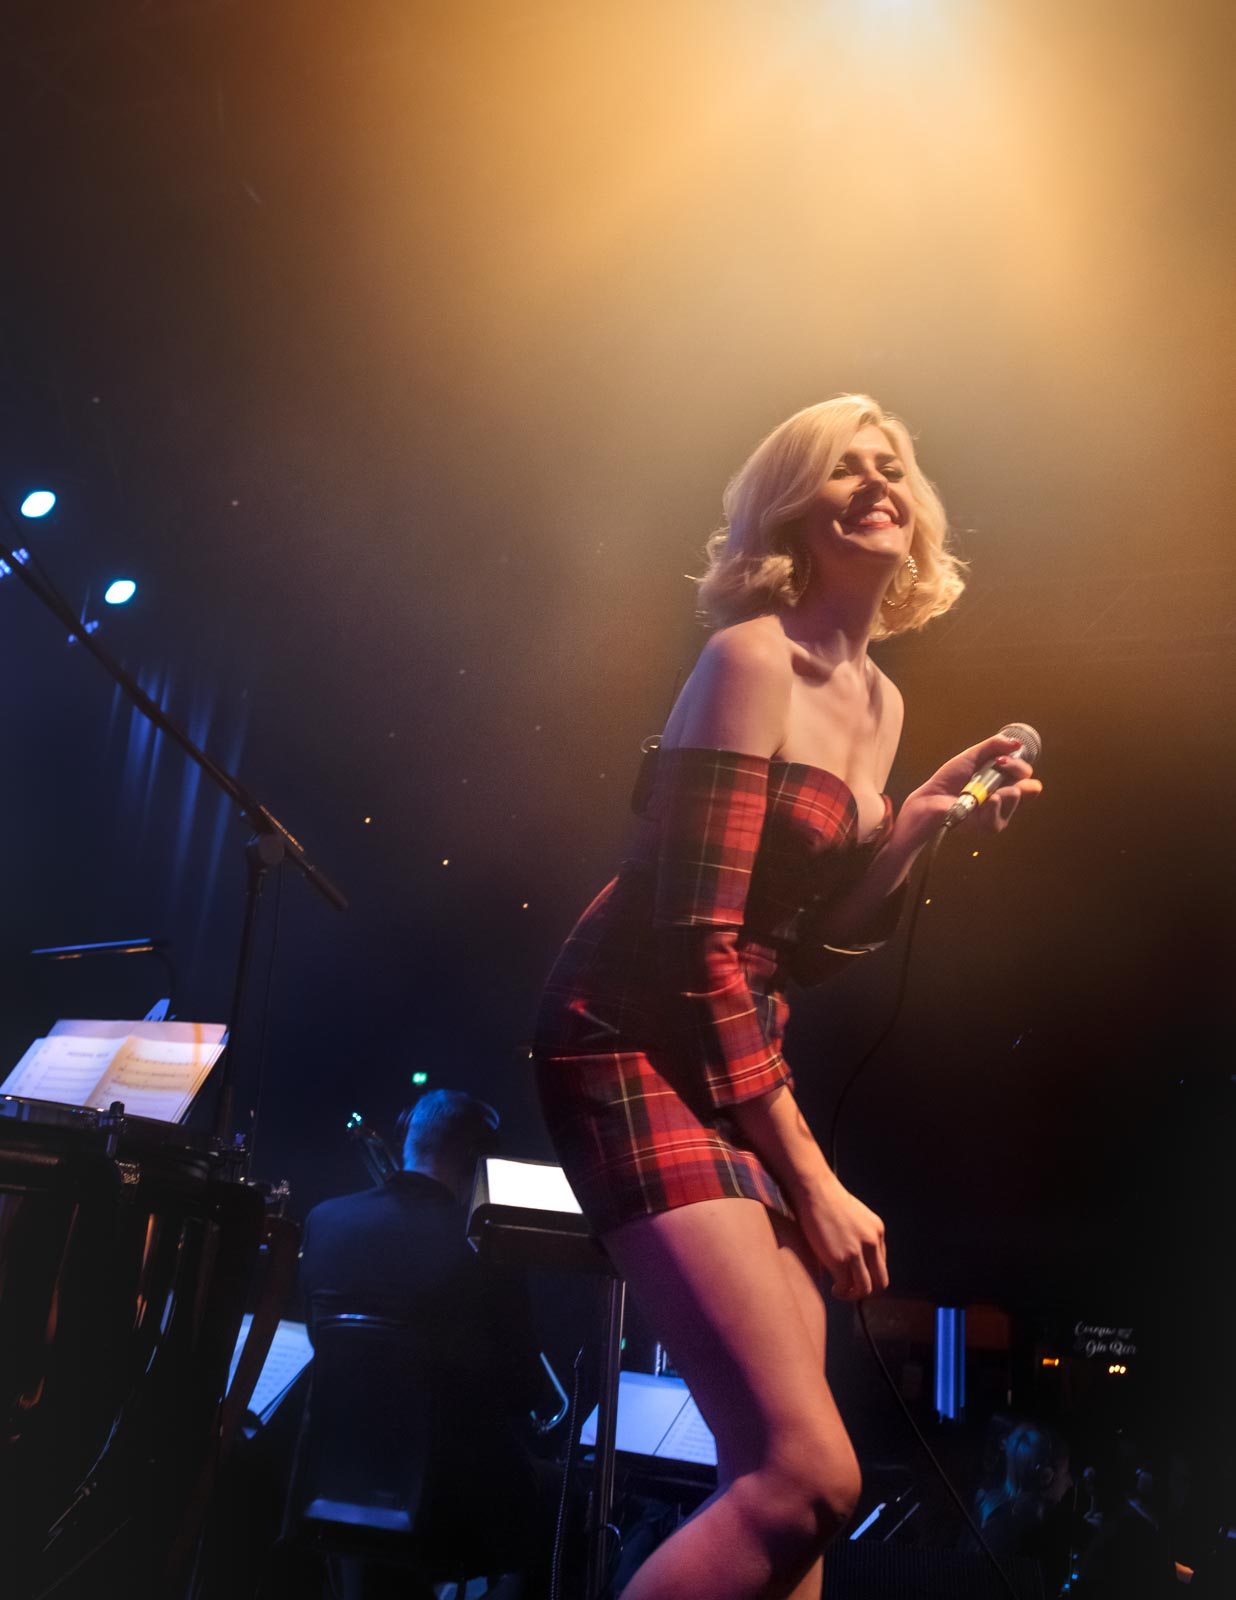 Vocalist Gemma Sugrue